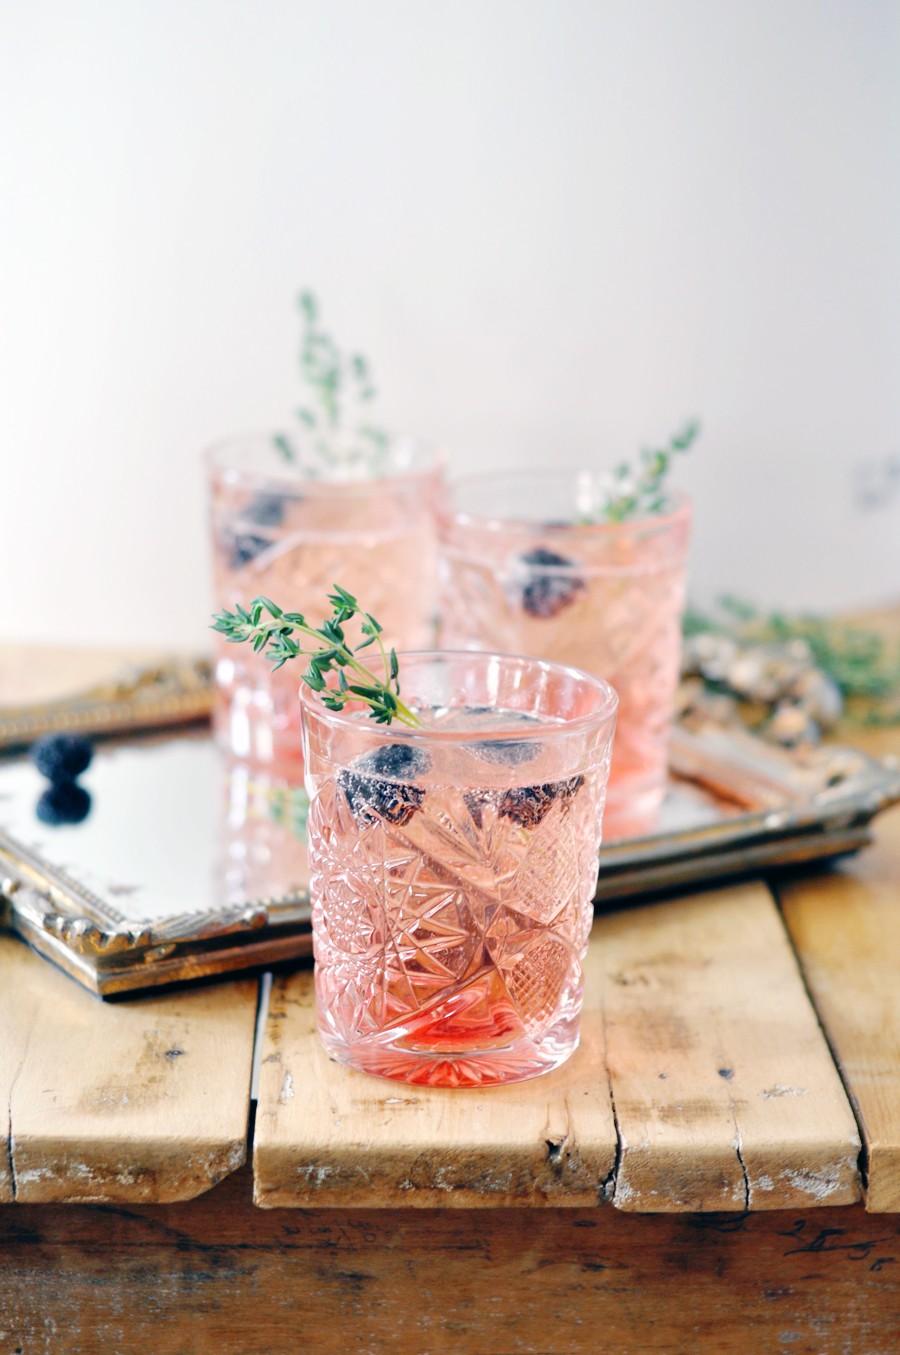 9. The Love Potion Cocktail - via Jacquelyn Clark